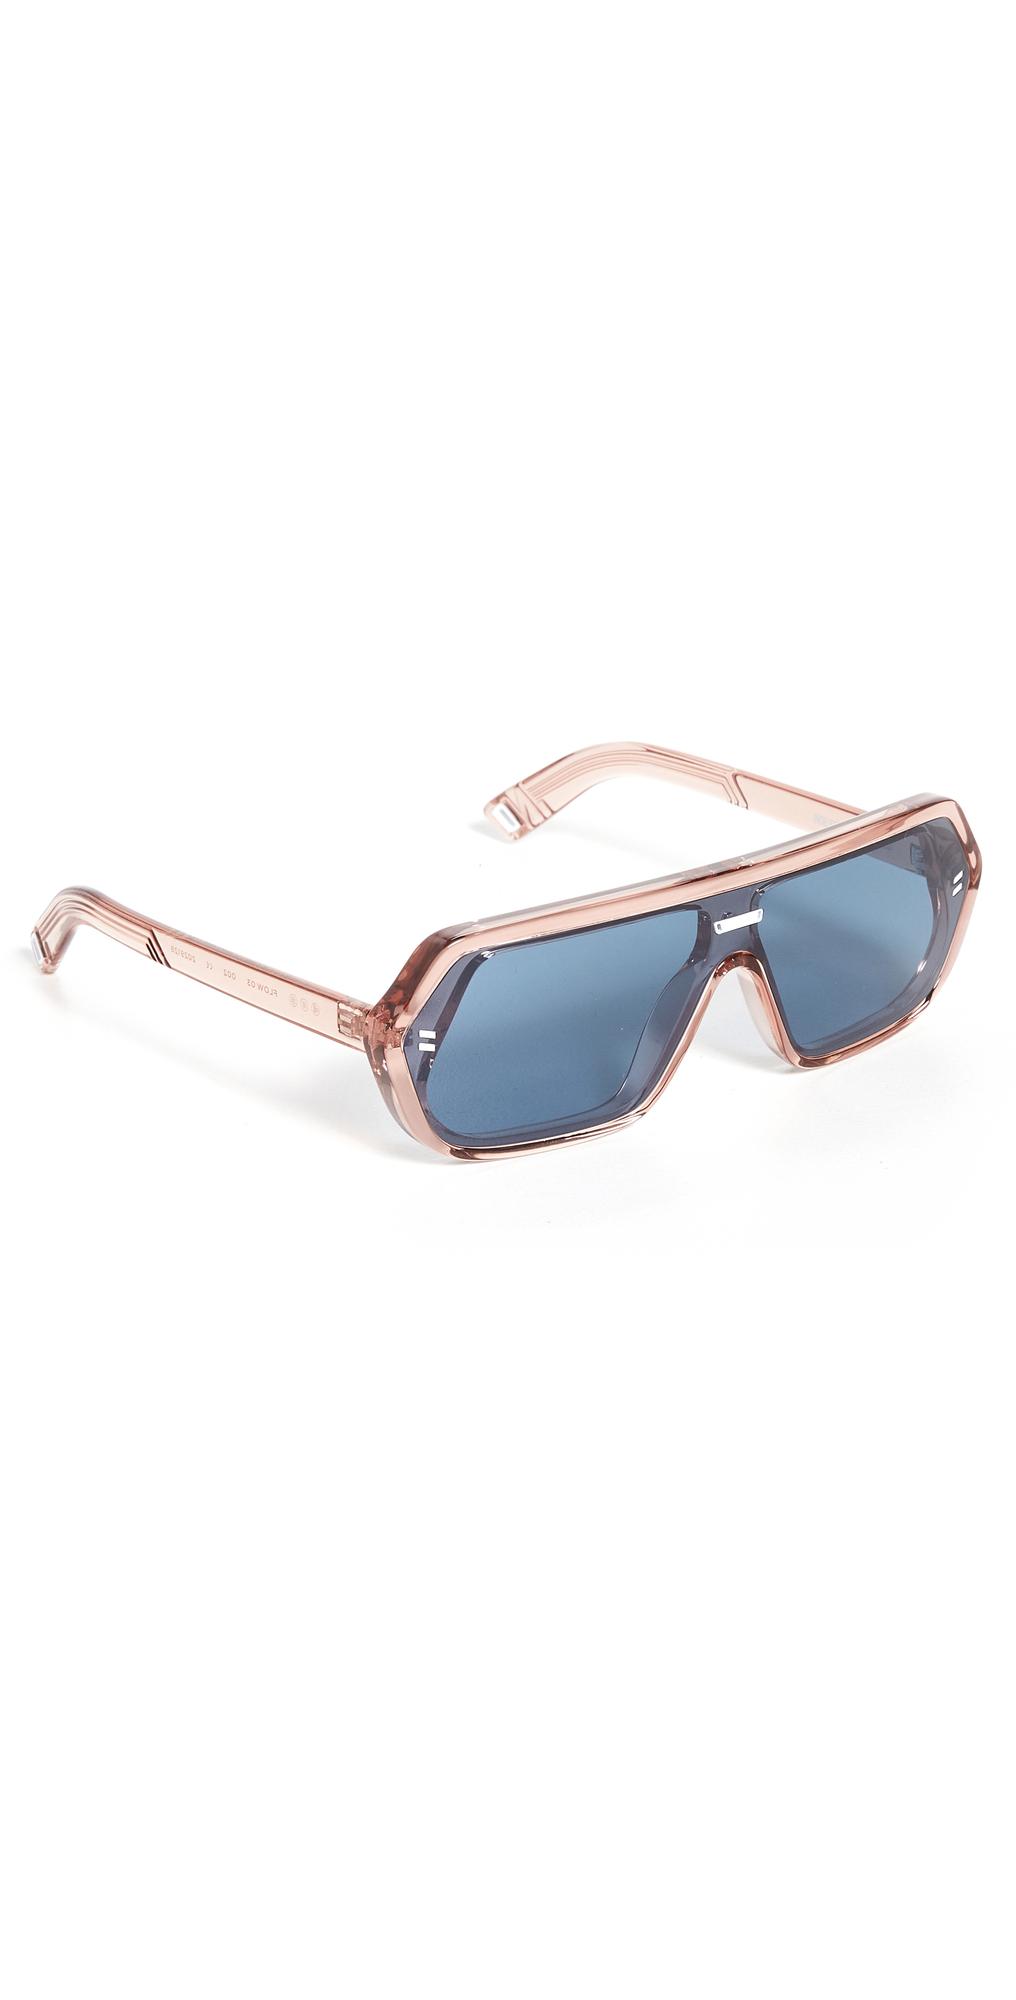 Flow 03 Sunglasses